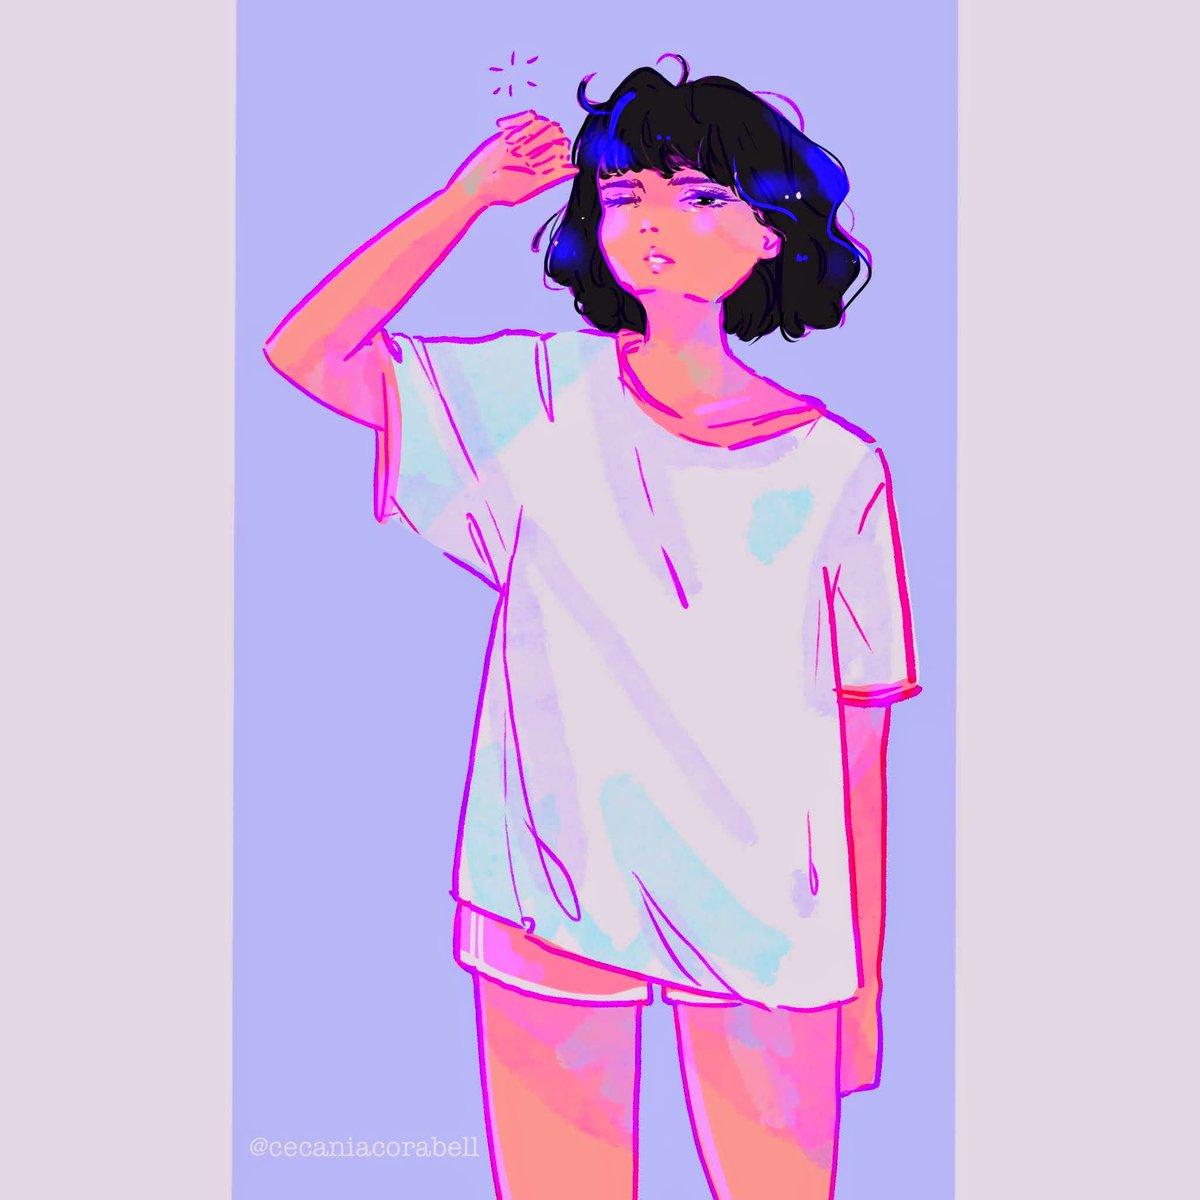 Put your hand up if you wake up ugly  It feels like I woke up from an art slumber Lol  #artistsontwitter #digitalart #animegirl #cureartpic.twitter.com/cc5JFNfCat